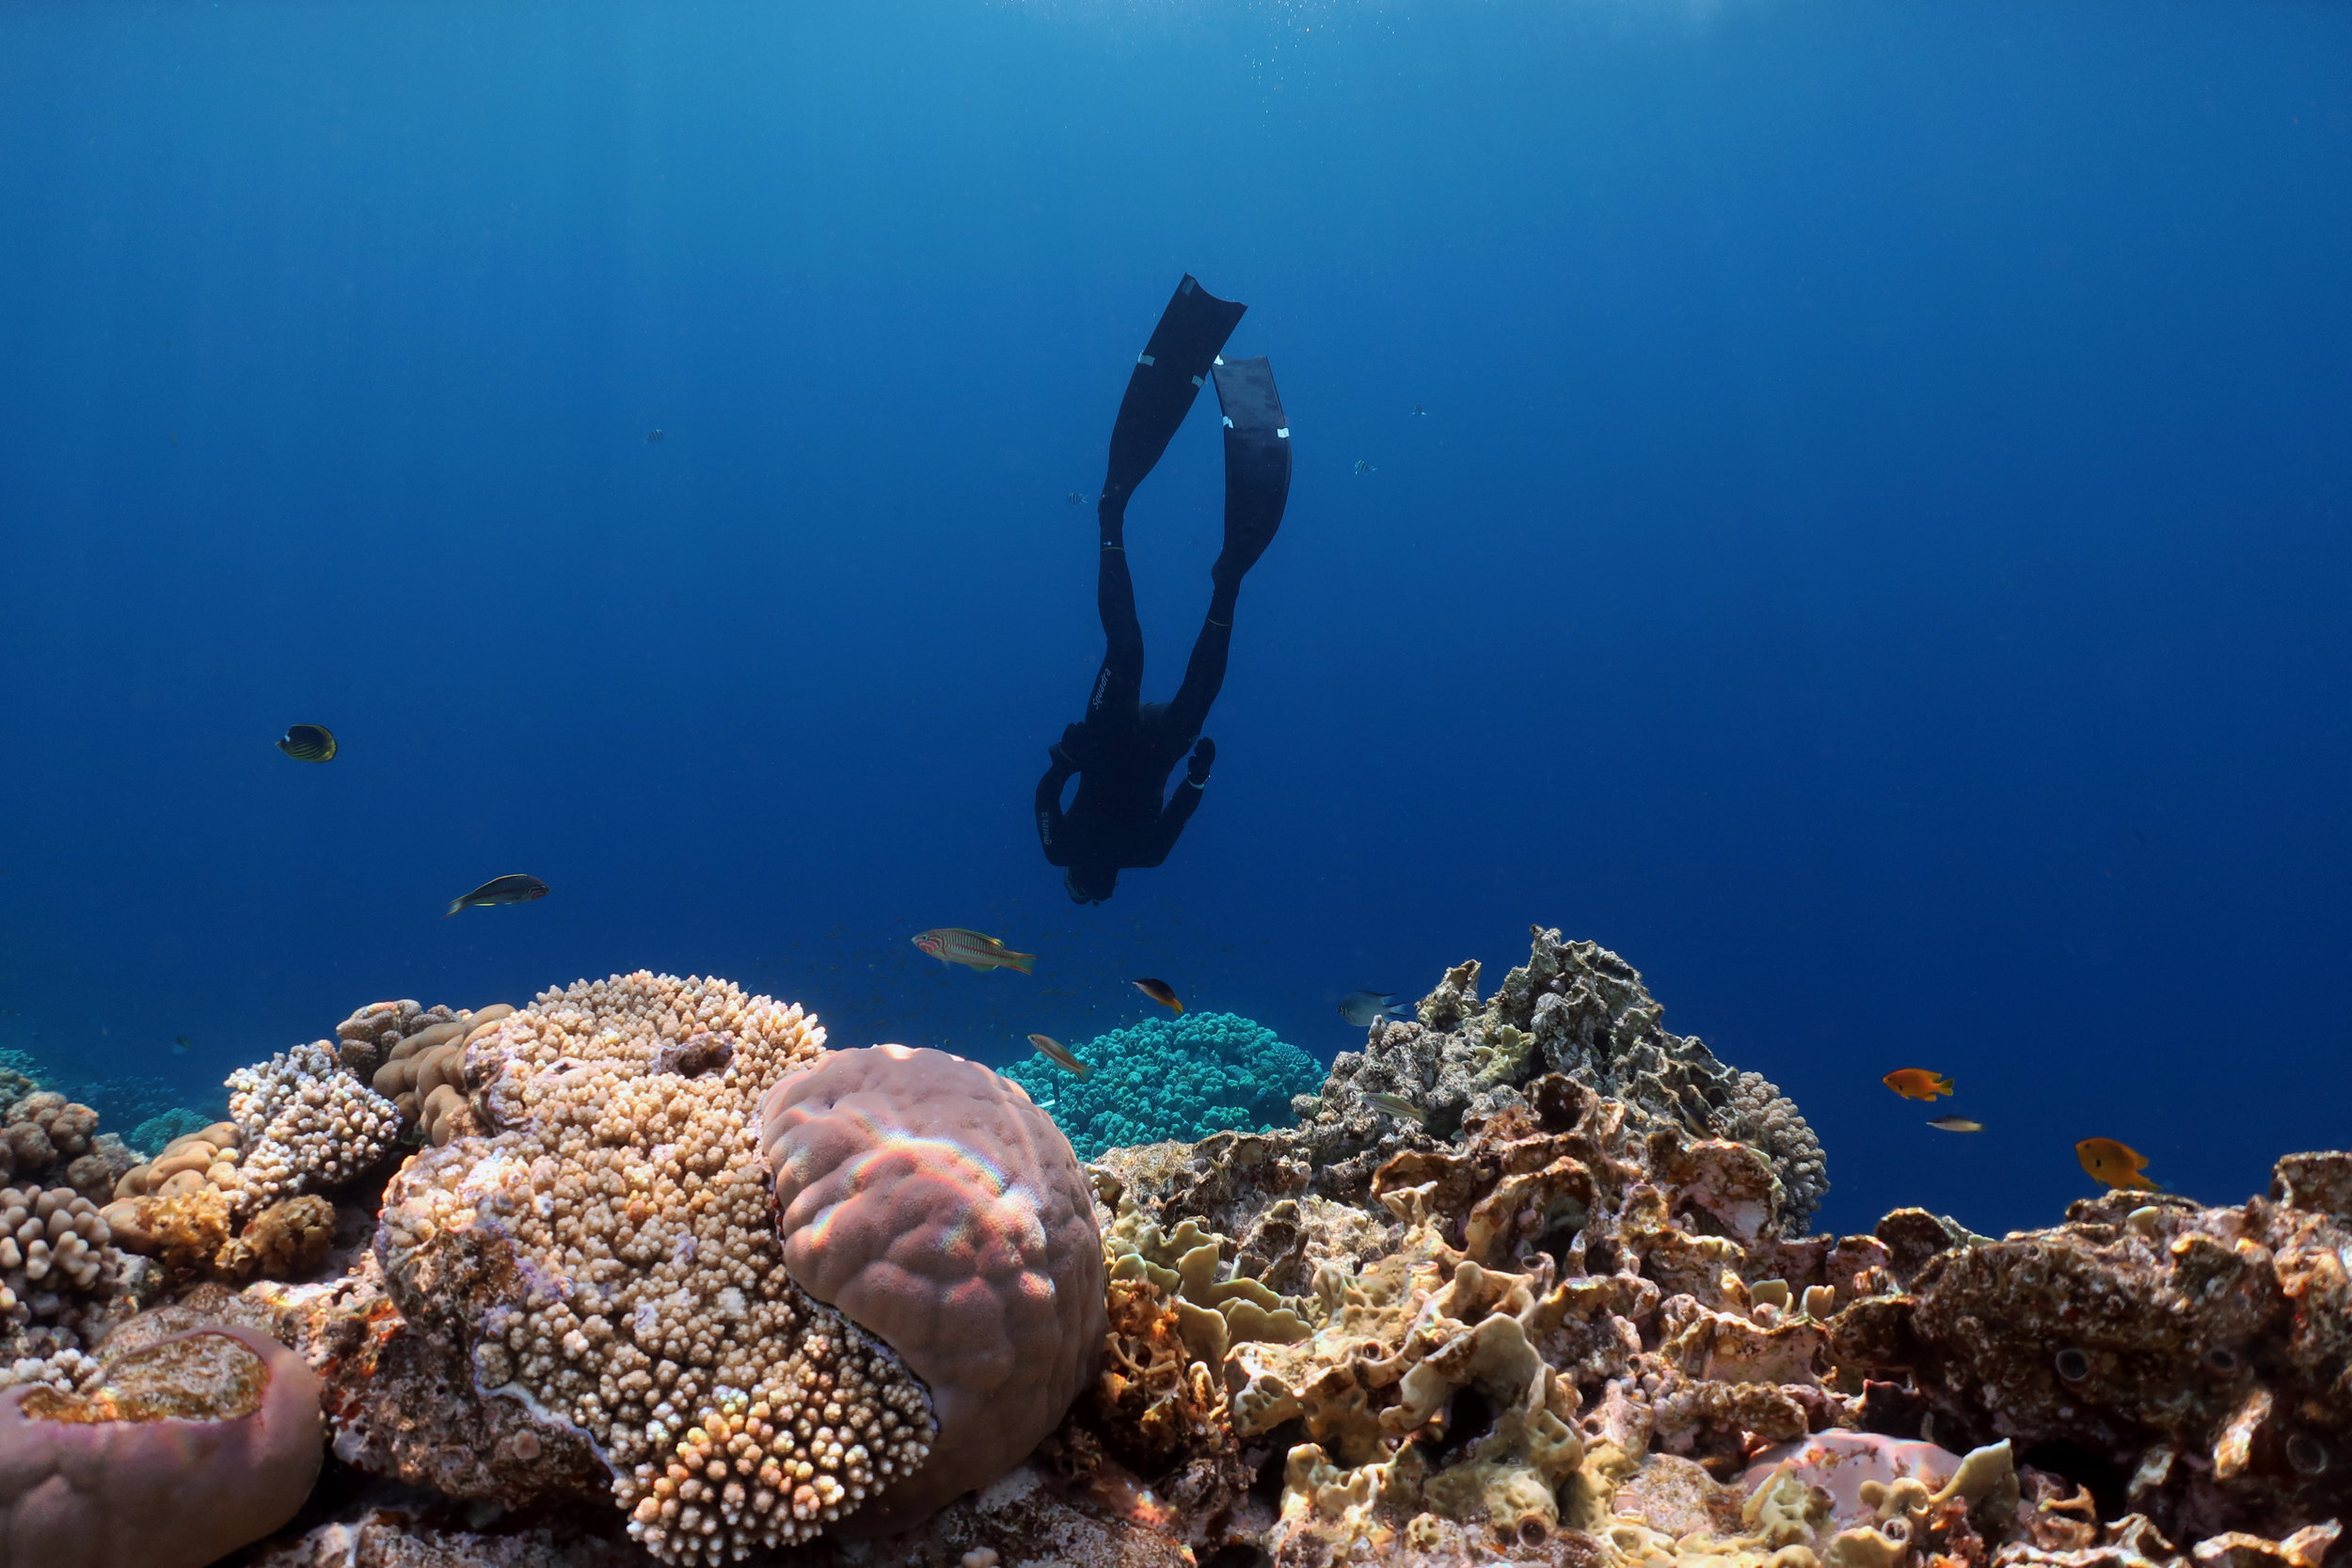 11 - FREEDIVER IN EGYPT CREDIT: ANETT SZASZI / coral reef image bank